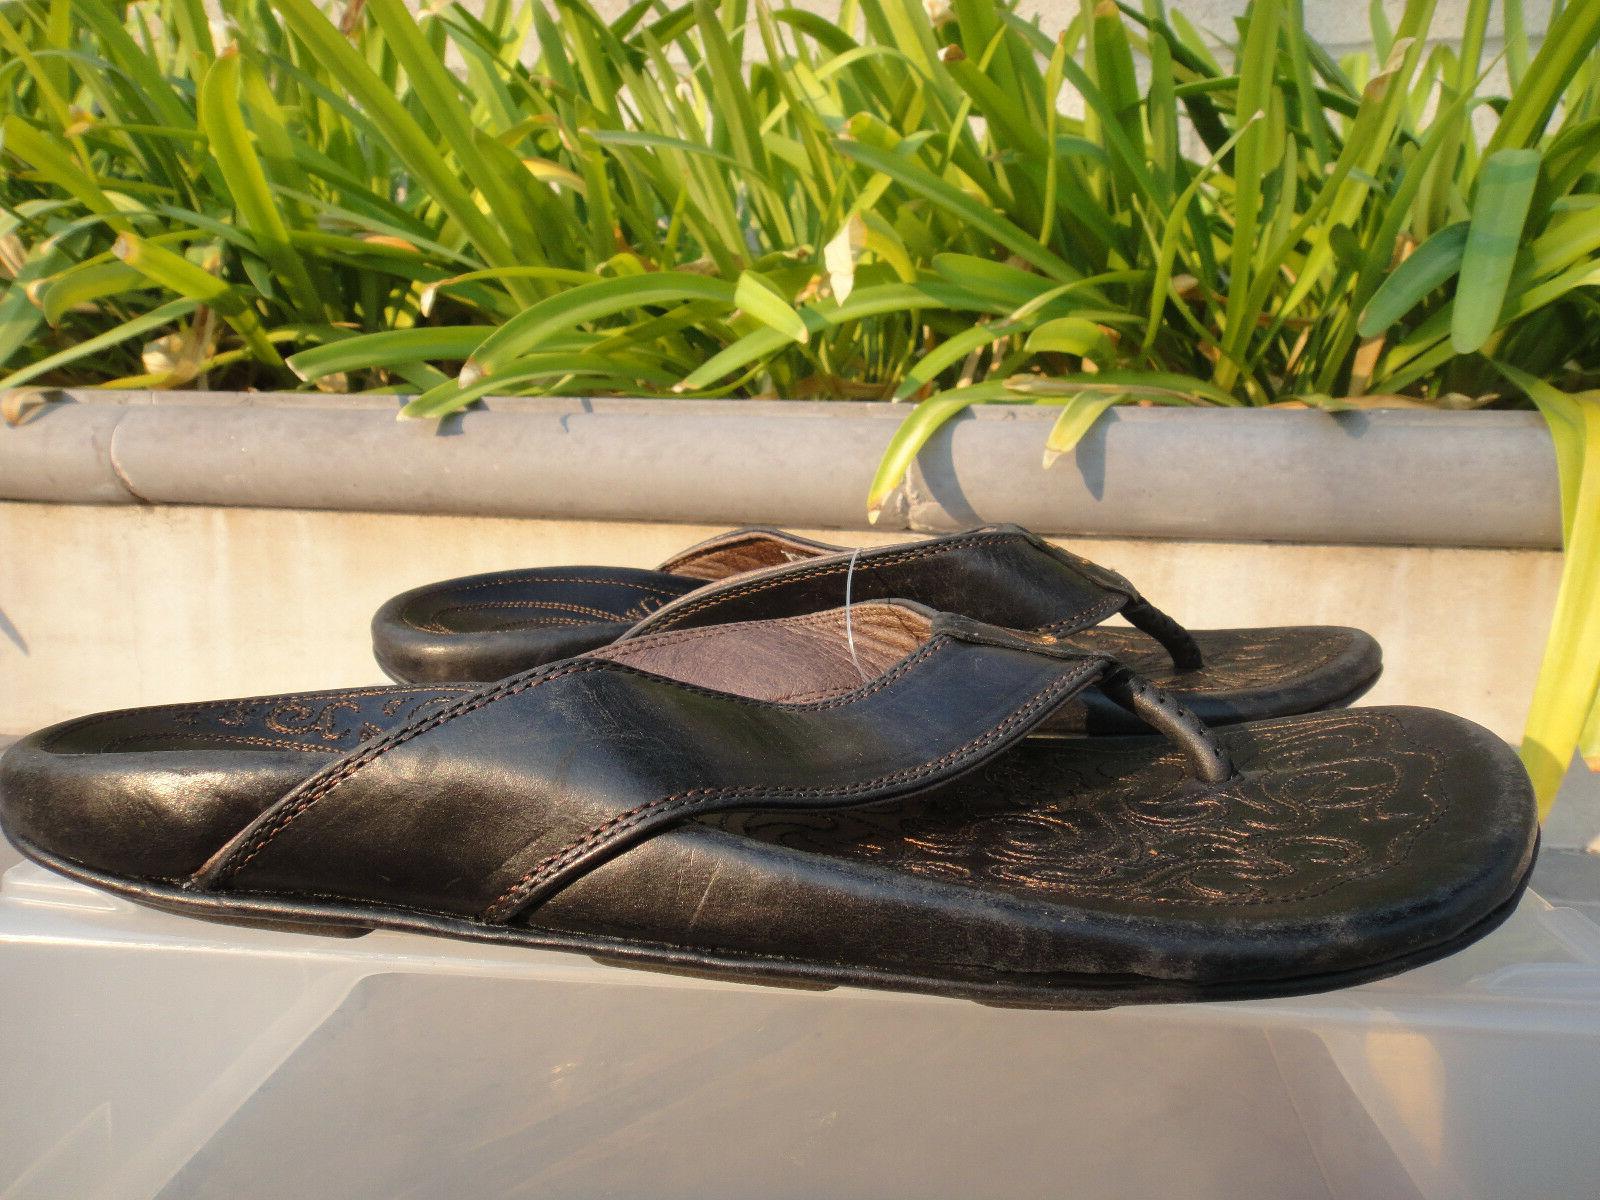 OluKai WAIMEA Thongs/Slippers, Stitched 10M 10317-4040